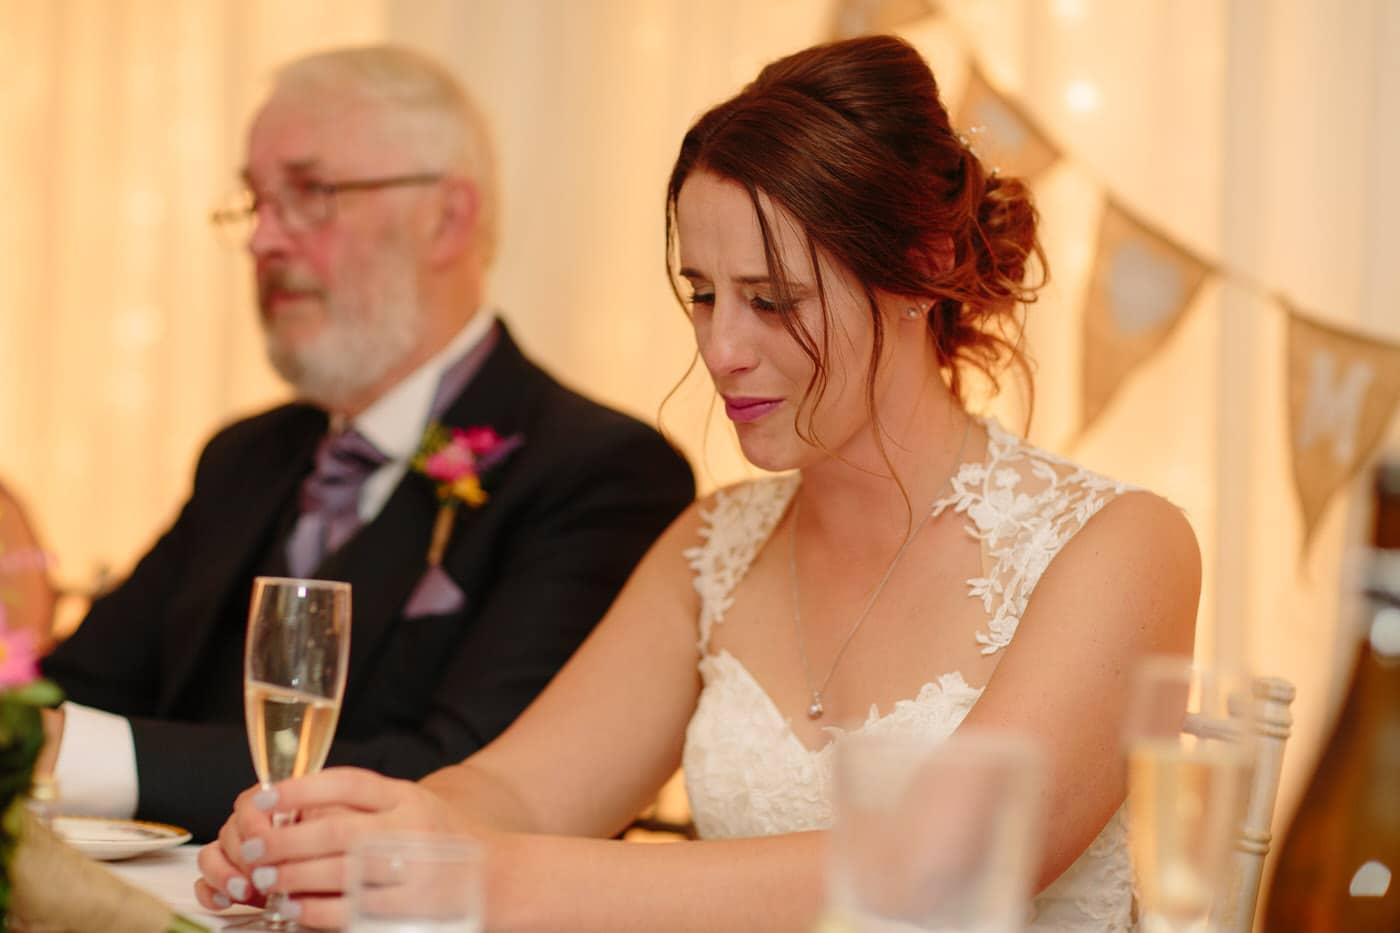 AA PENTREMAWRNORTH WALES WEDDING 2256